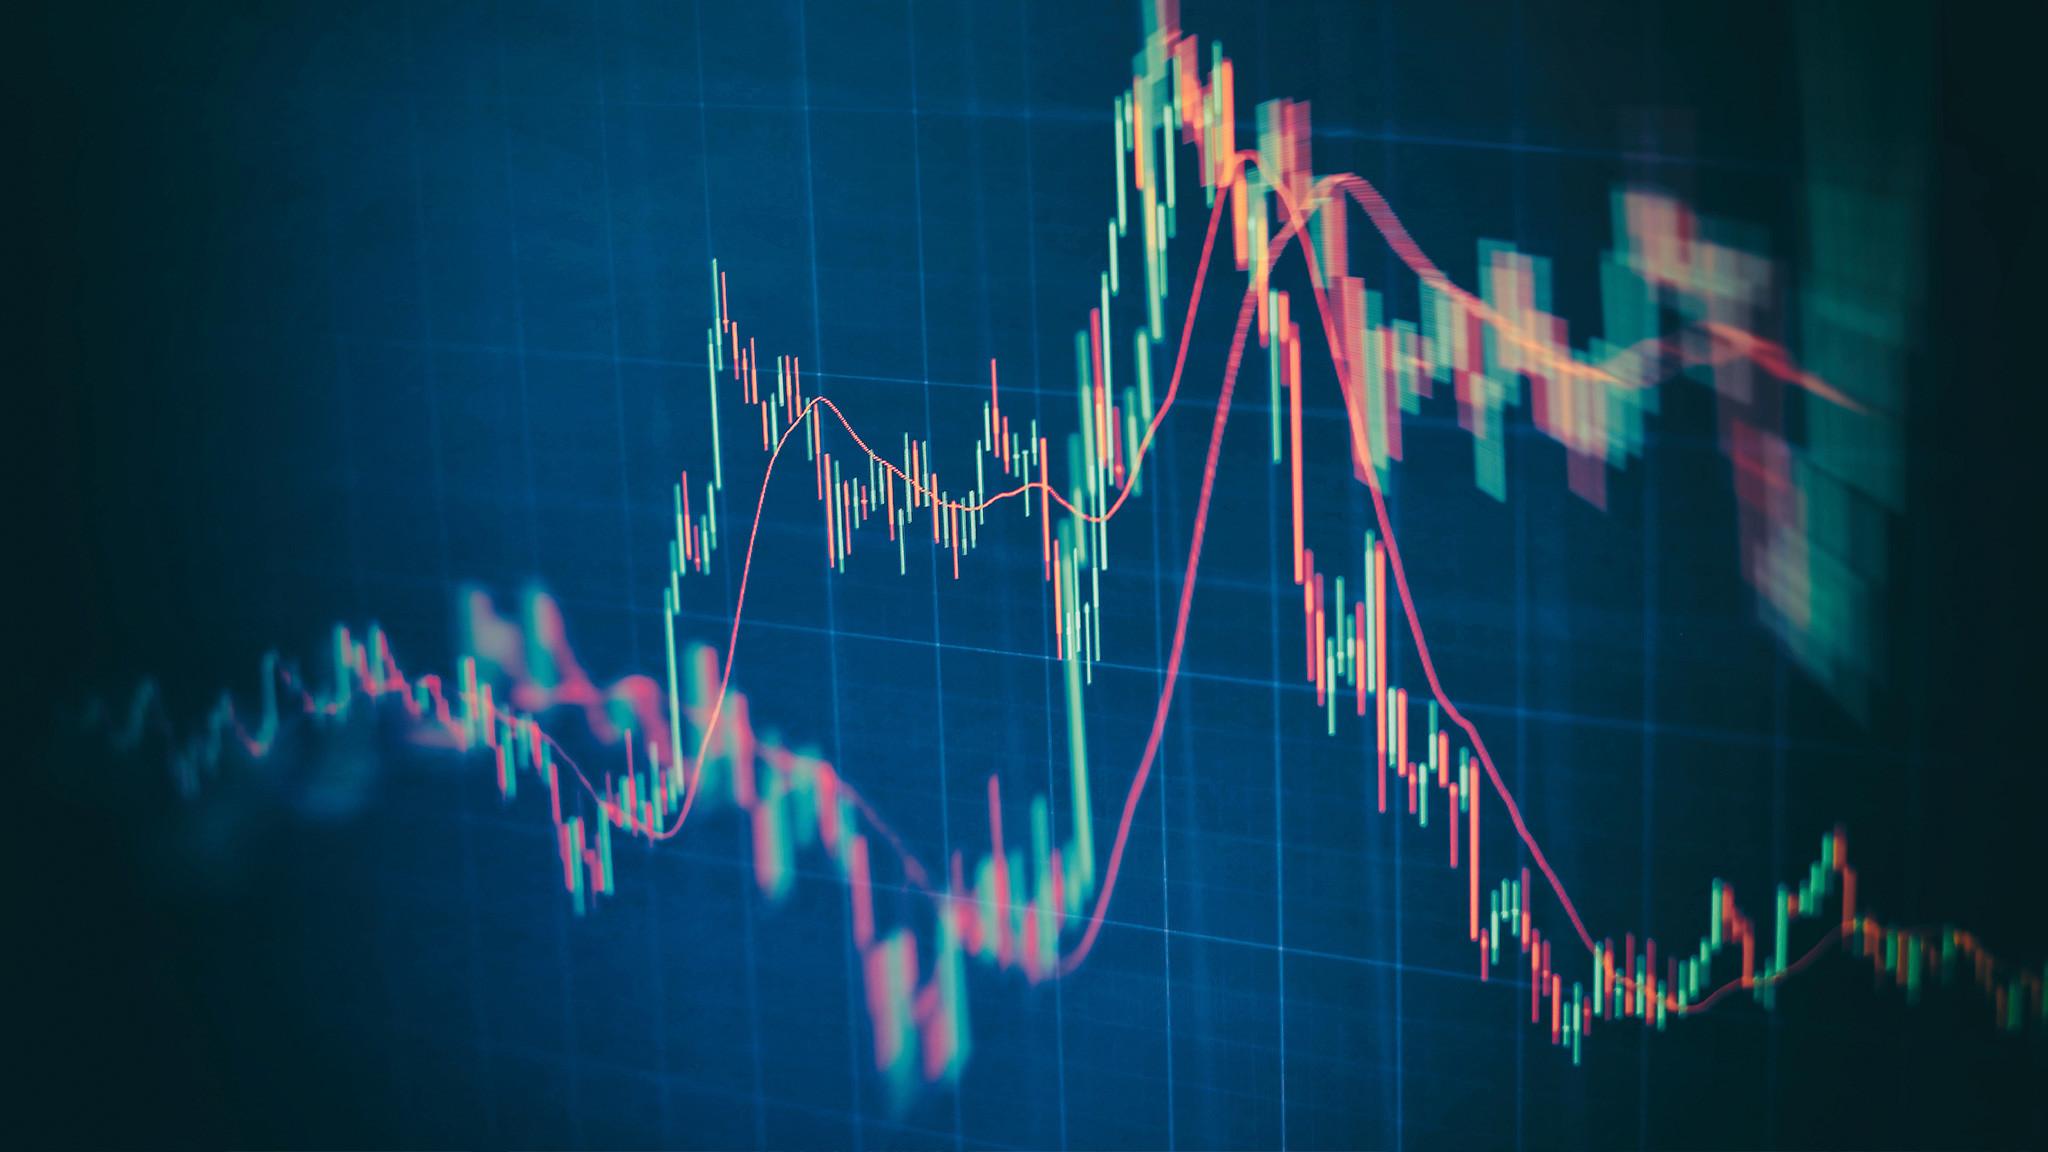 vw aktienkurs dividende